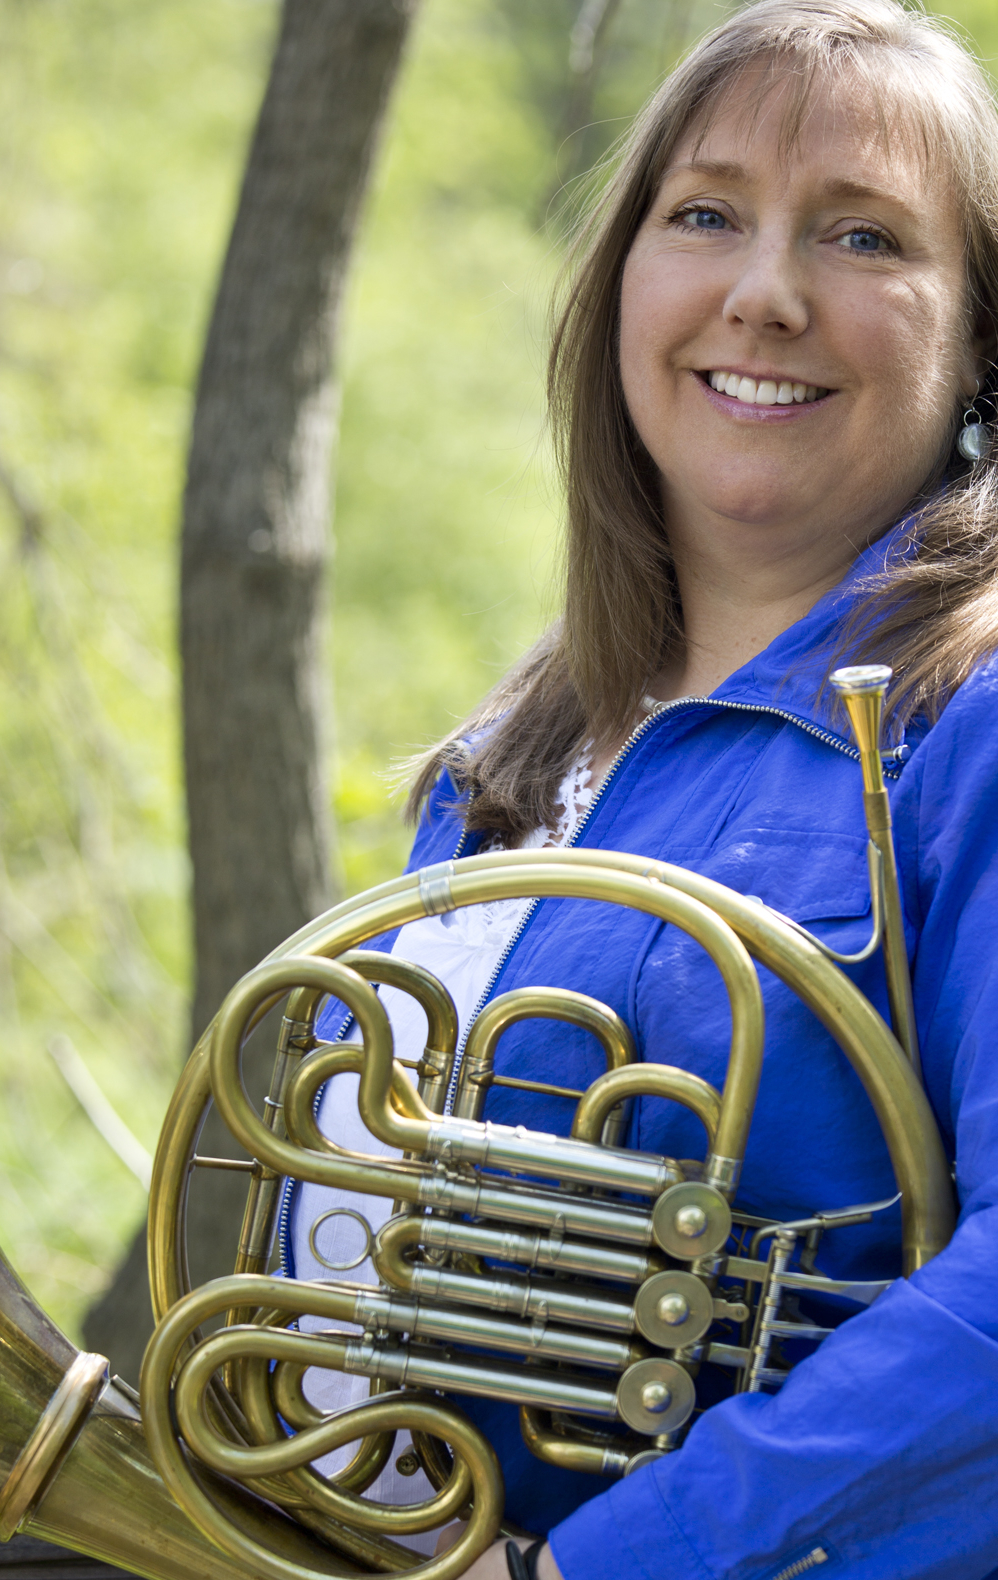 Michelle Stebleton